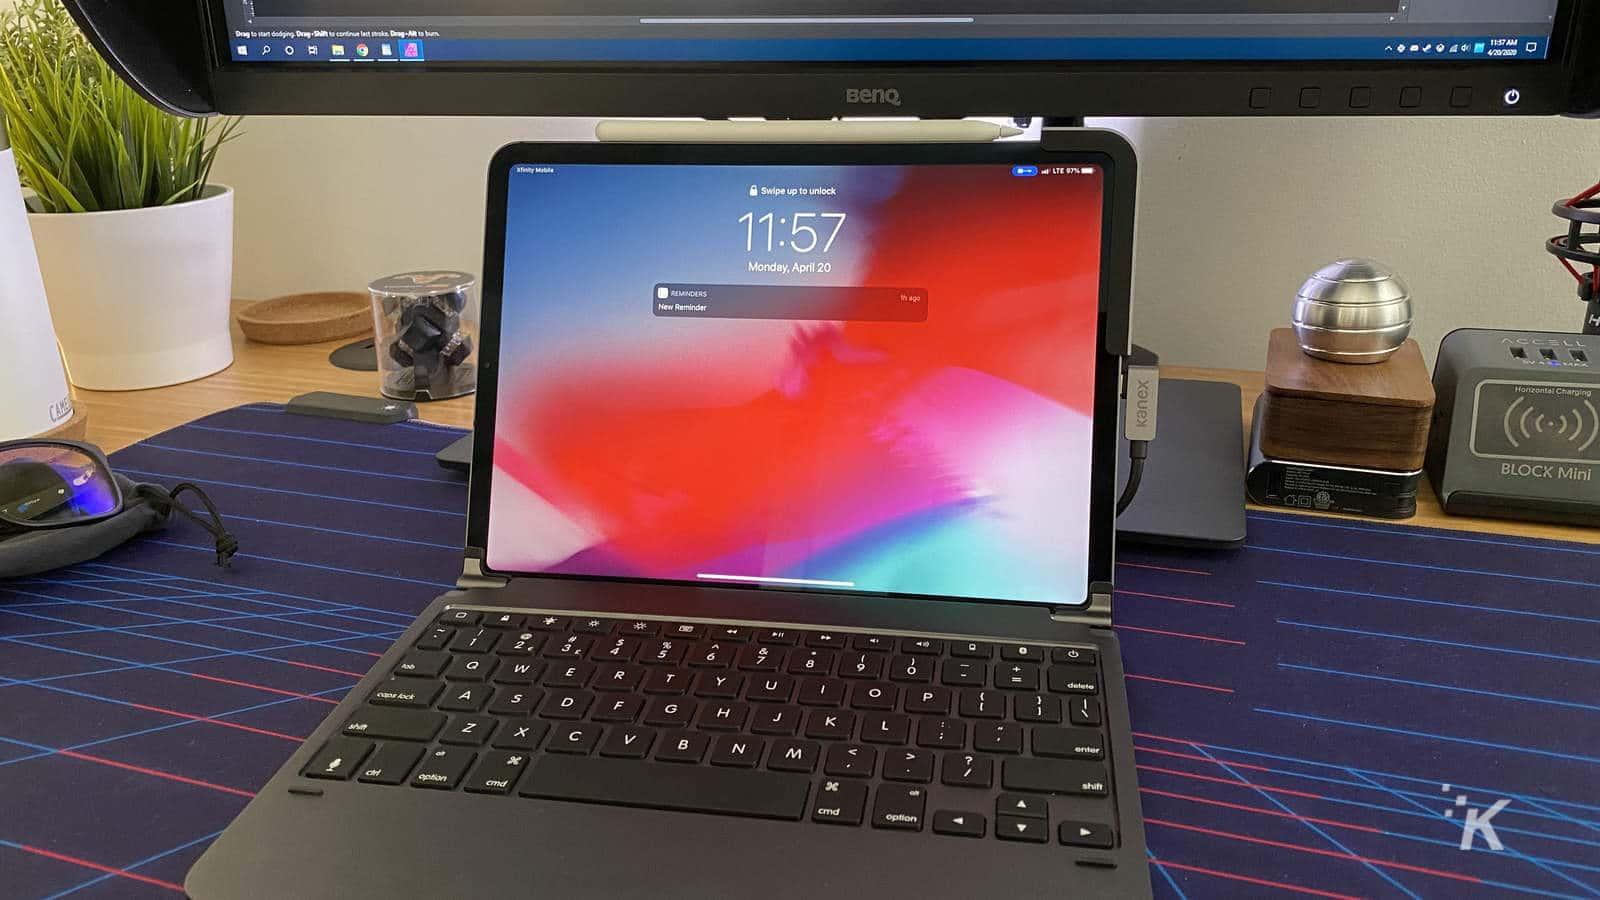 comcast mobile on an ipad